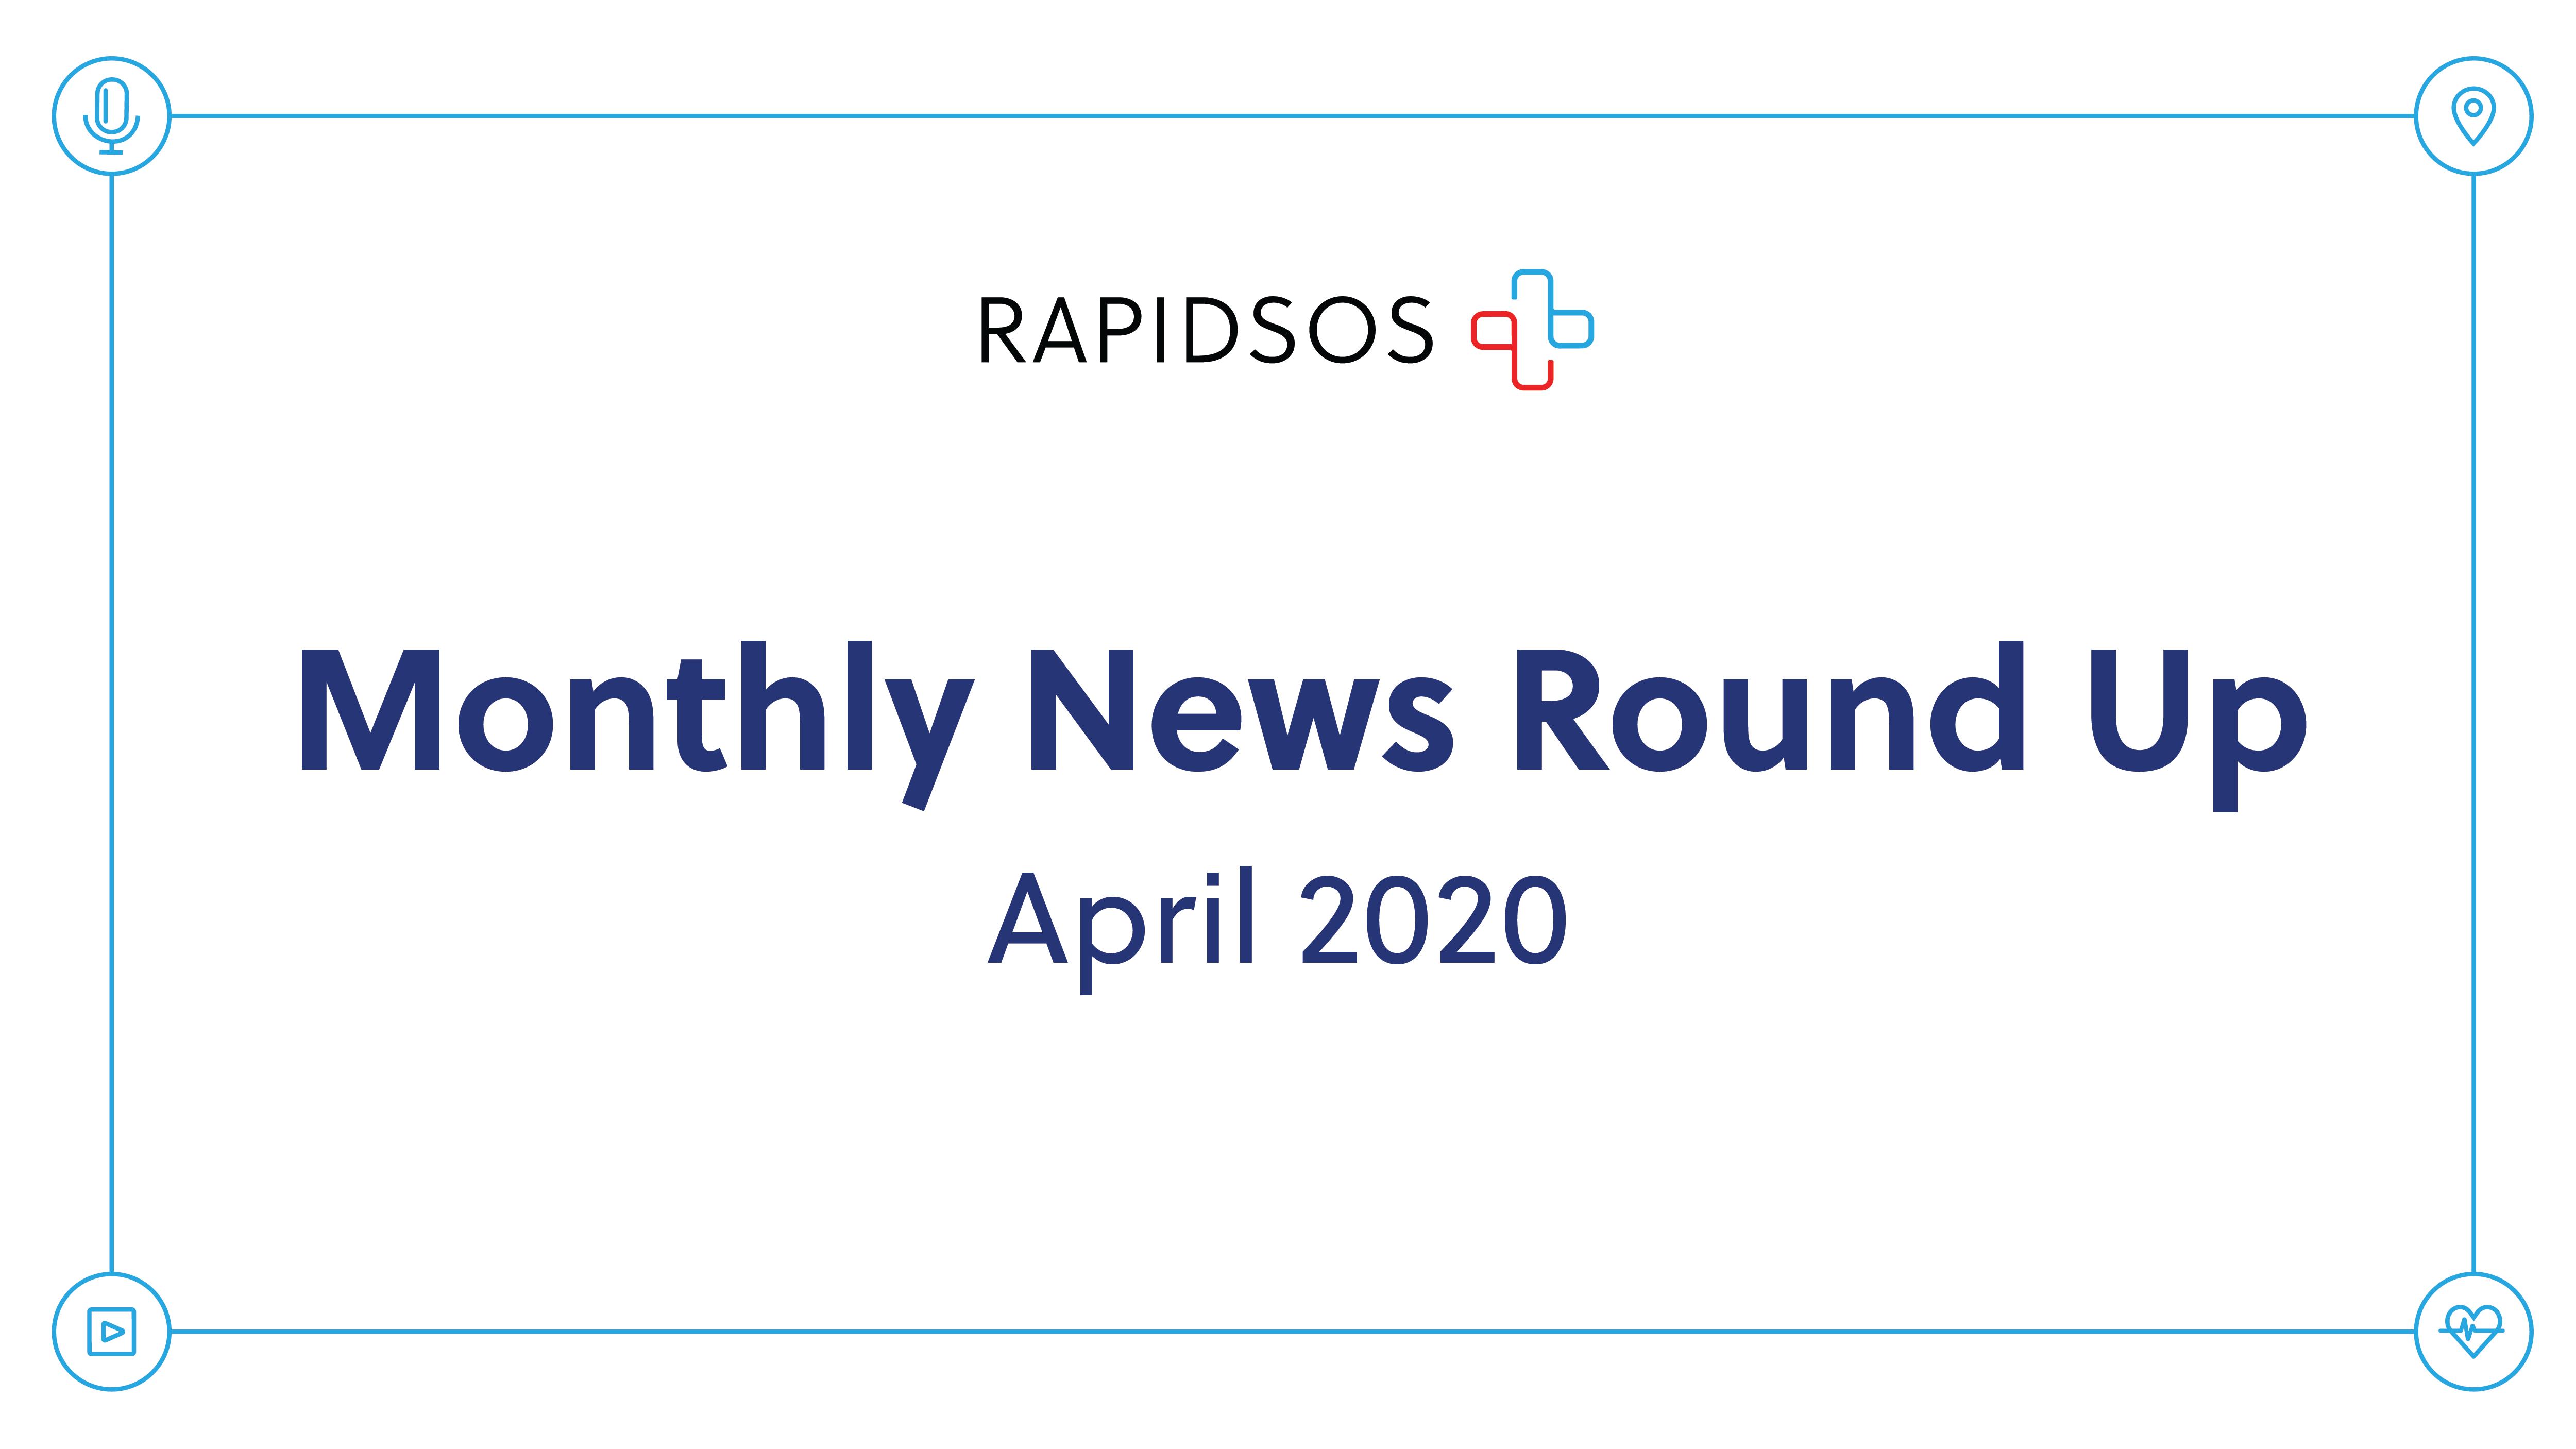 News Round Up April